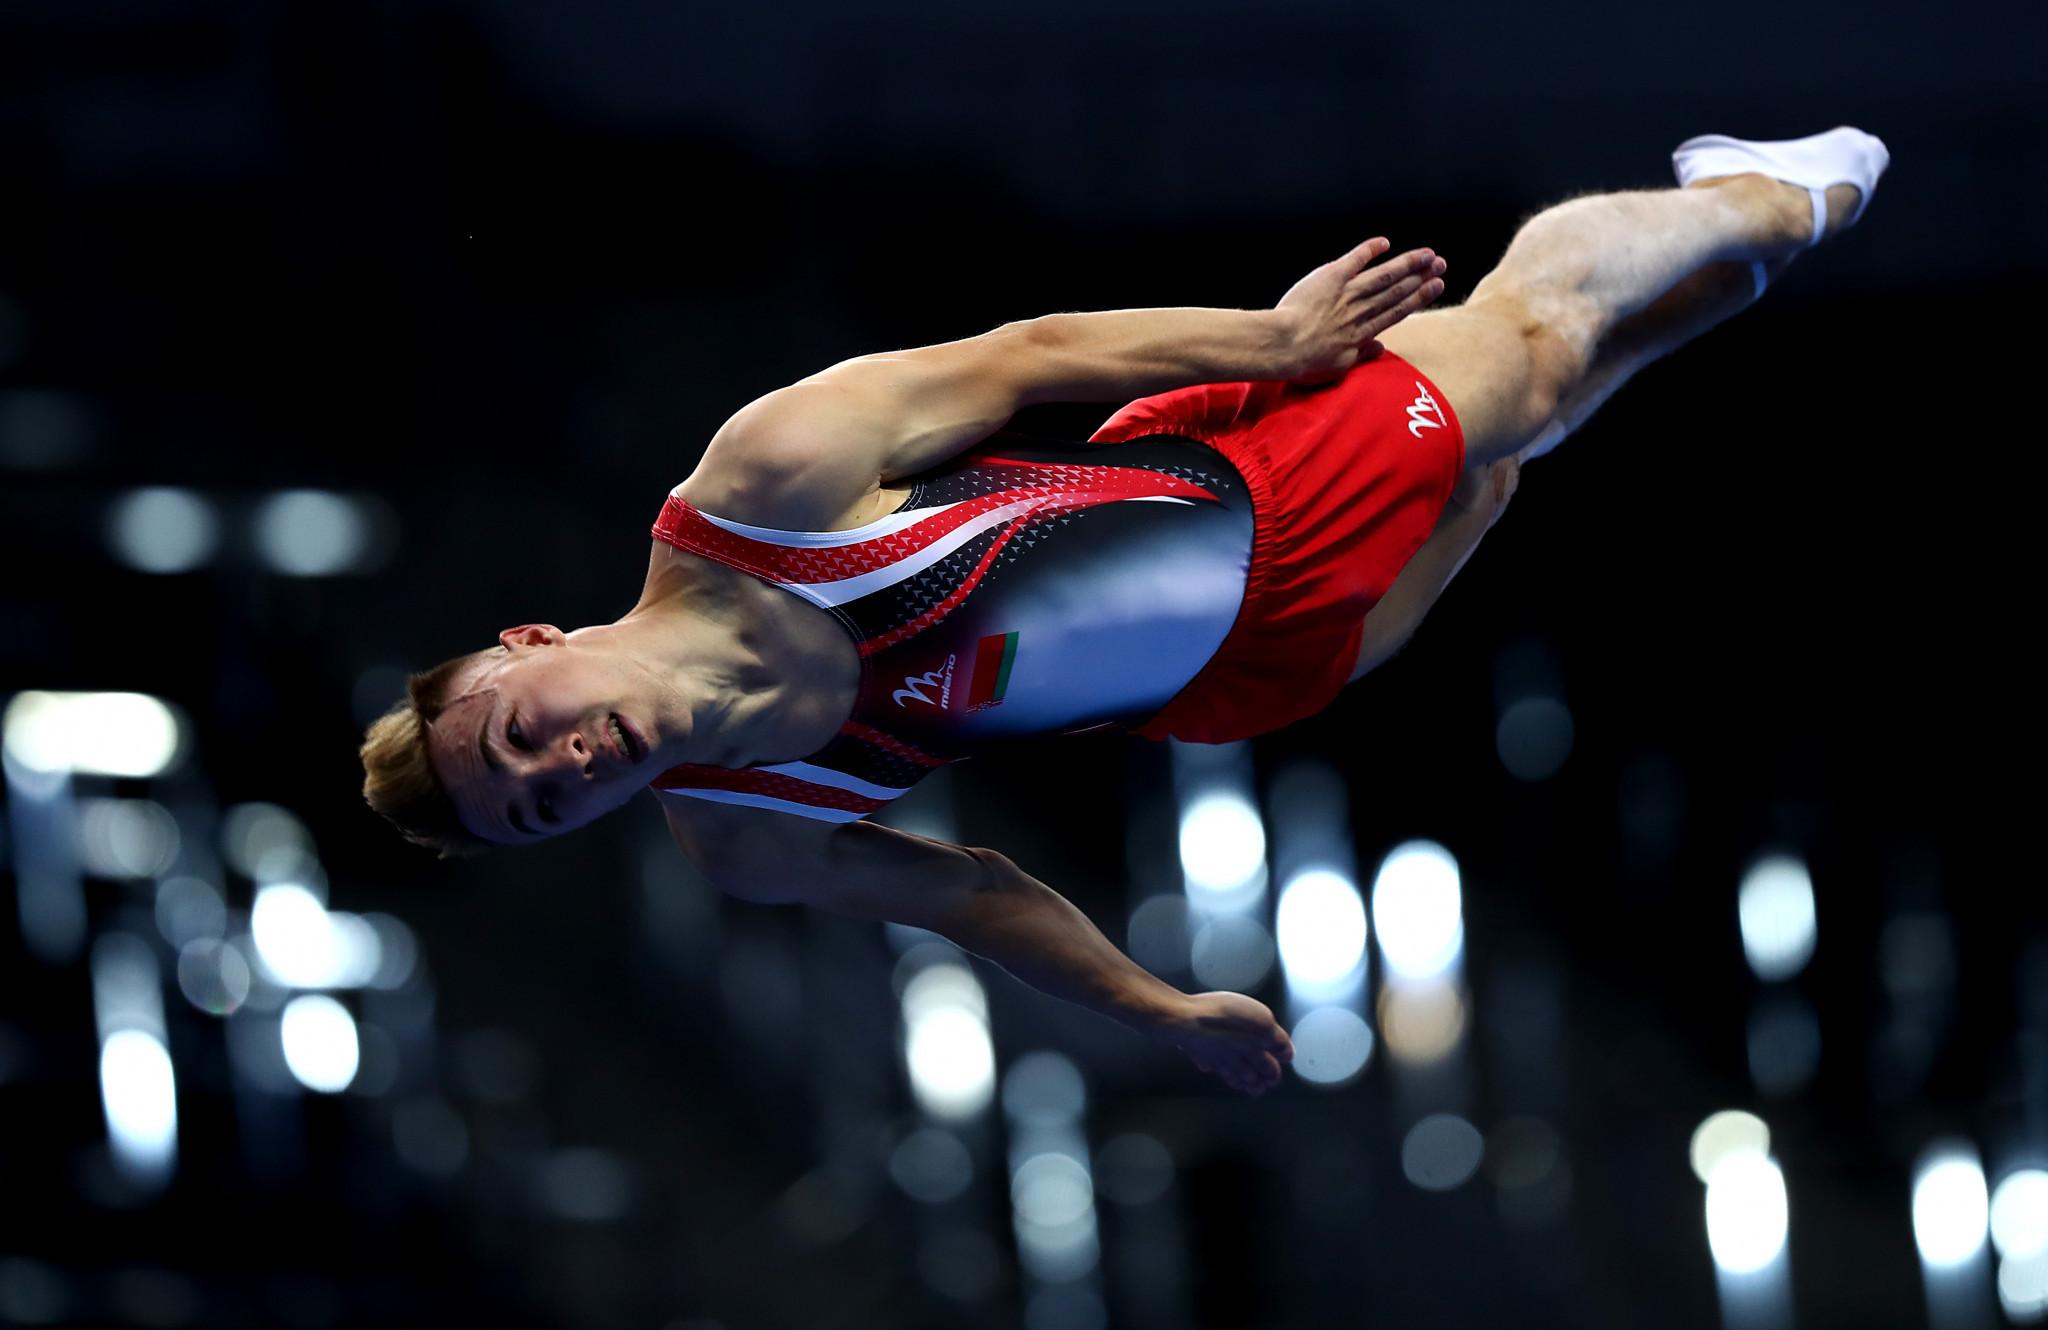 Rio 2016 champion Hancharou earns trampoline gold at European Games